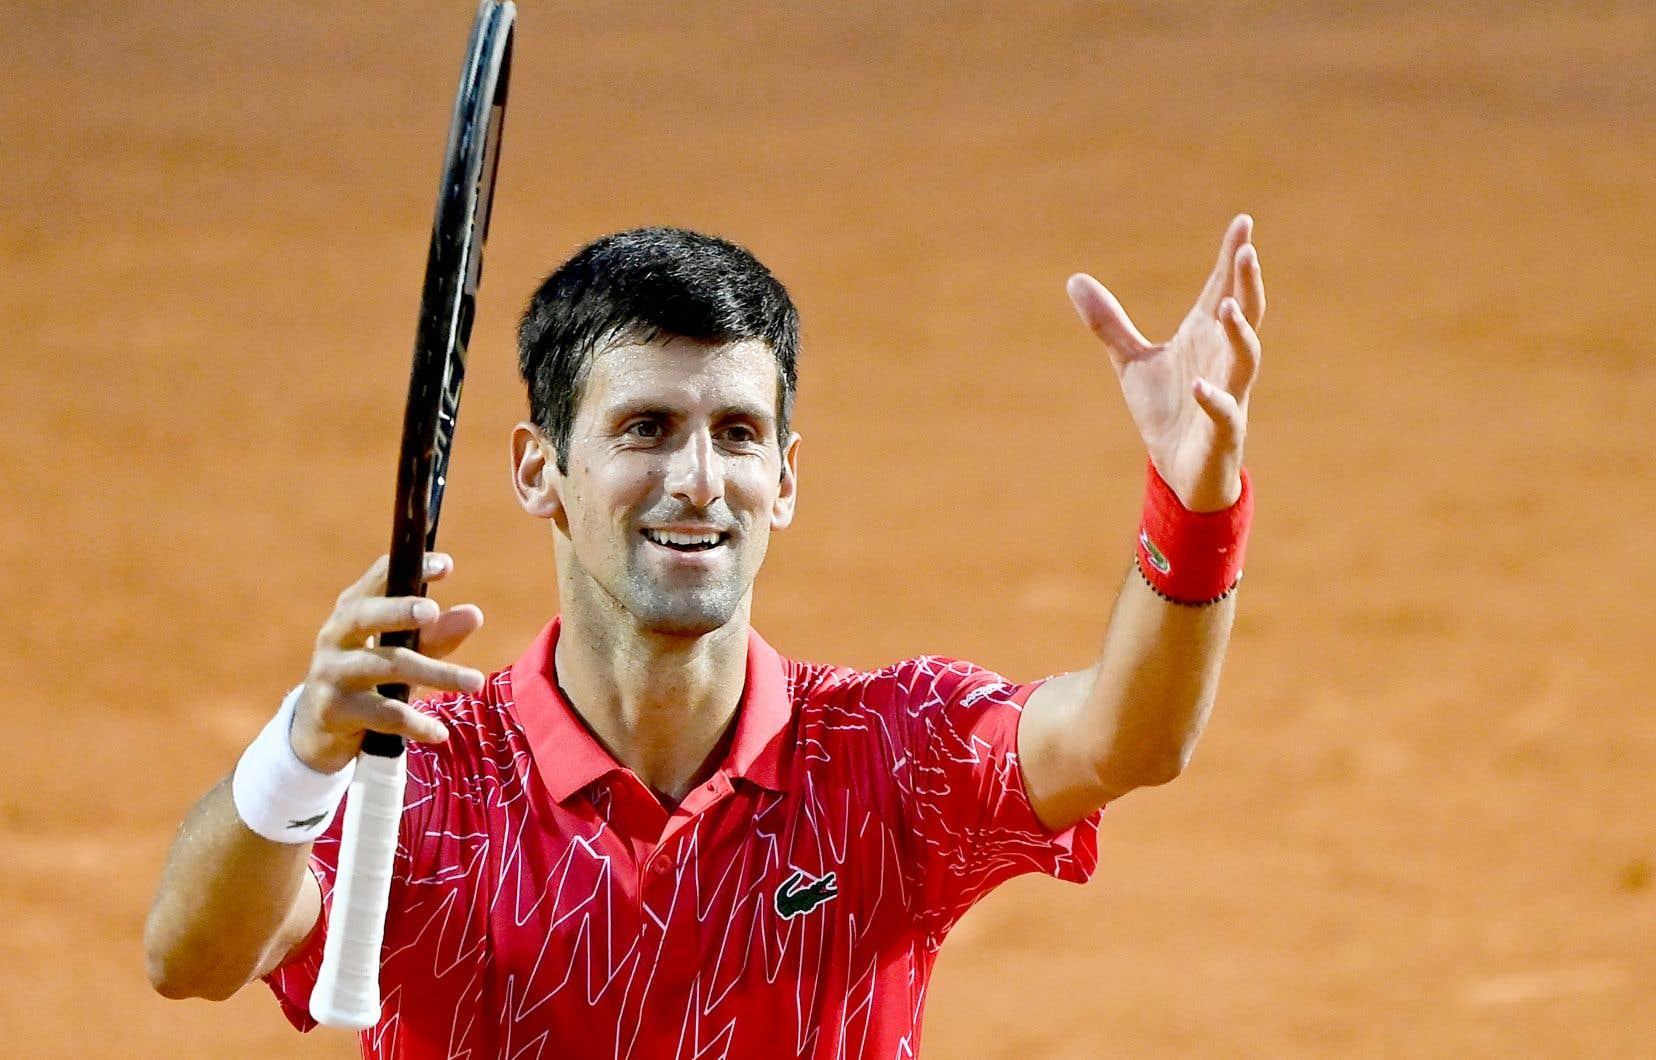 Avec sa victoire contre Diego Schwartzman, lundi, le Serbe Novak Djokovic a remporté un cinquième titre à Rome.